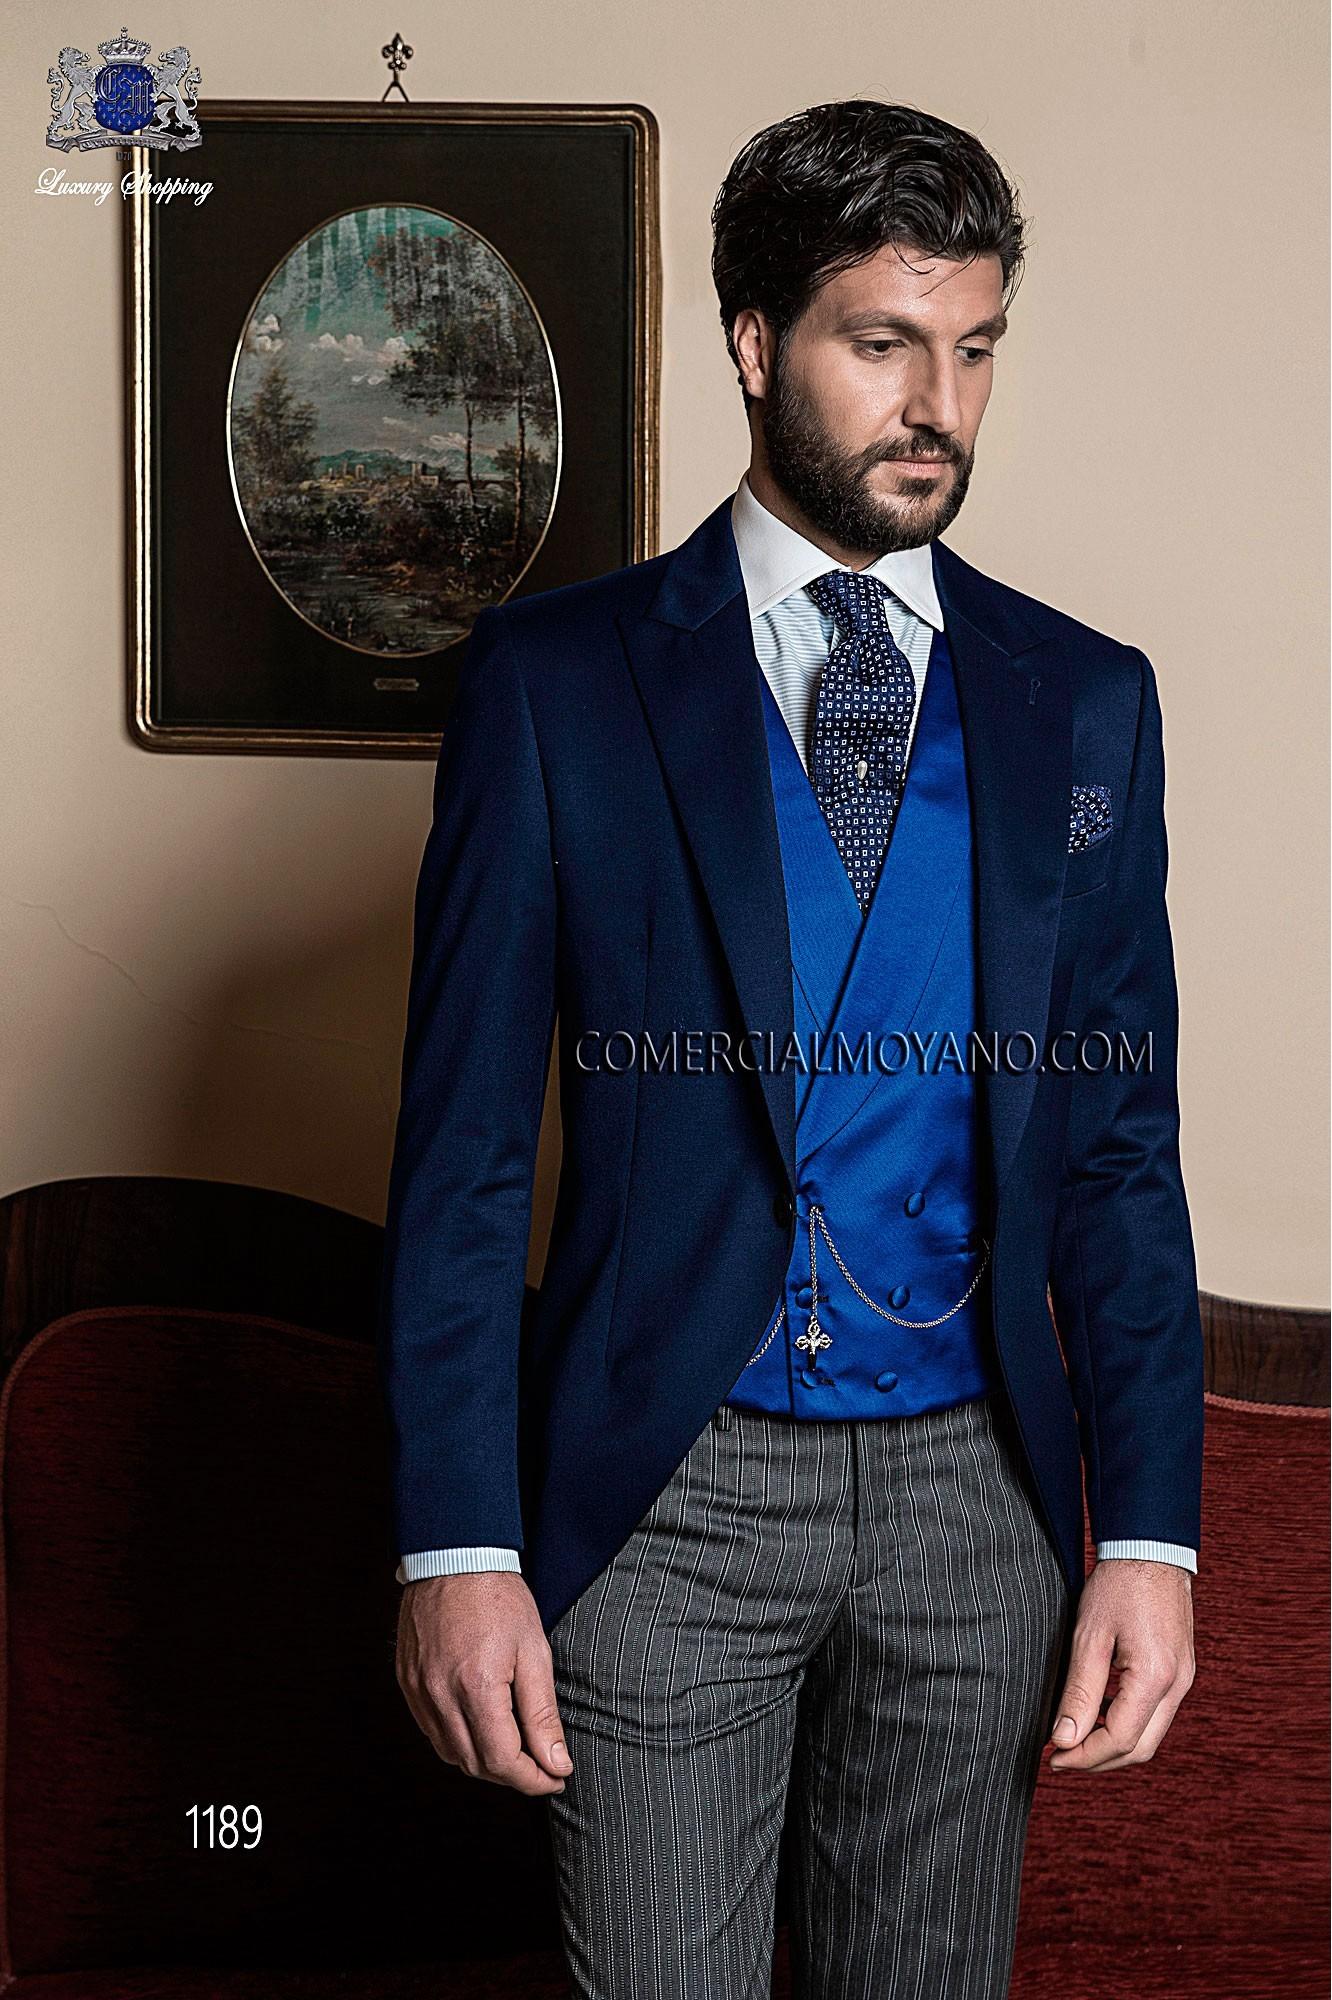 Traje de novio italiano a medida levita azul con pantalón diplomático gris, modelo 1189 Ottavio Nuccio Gala colección Gentleman.